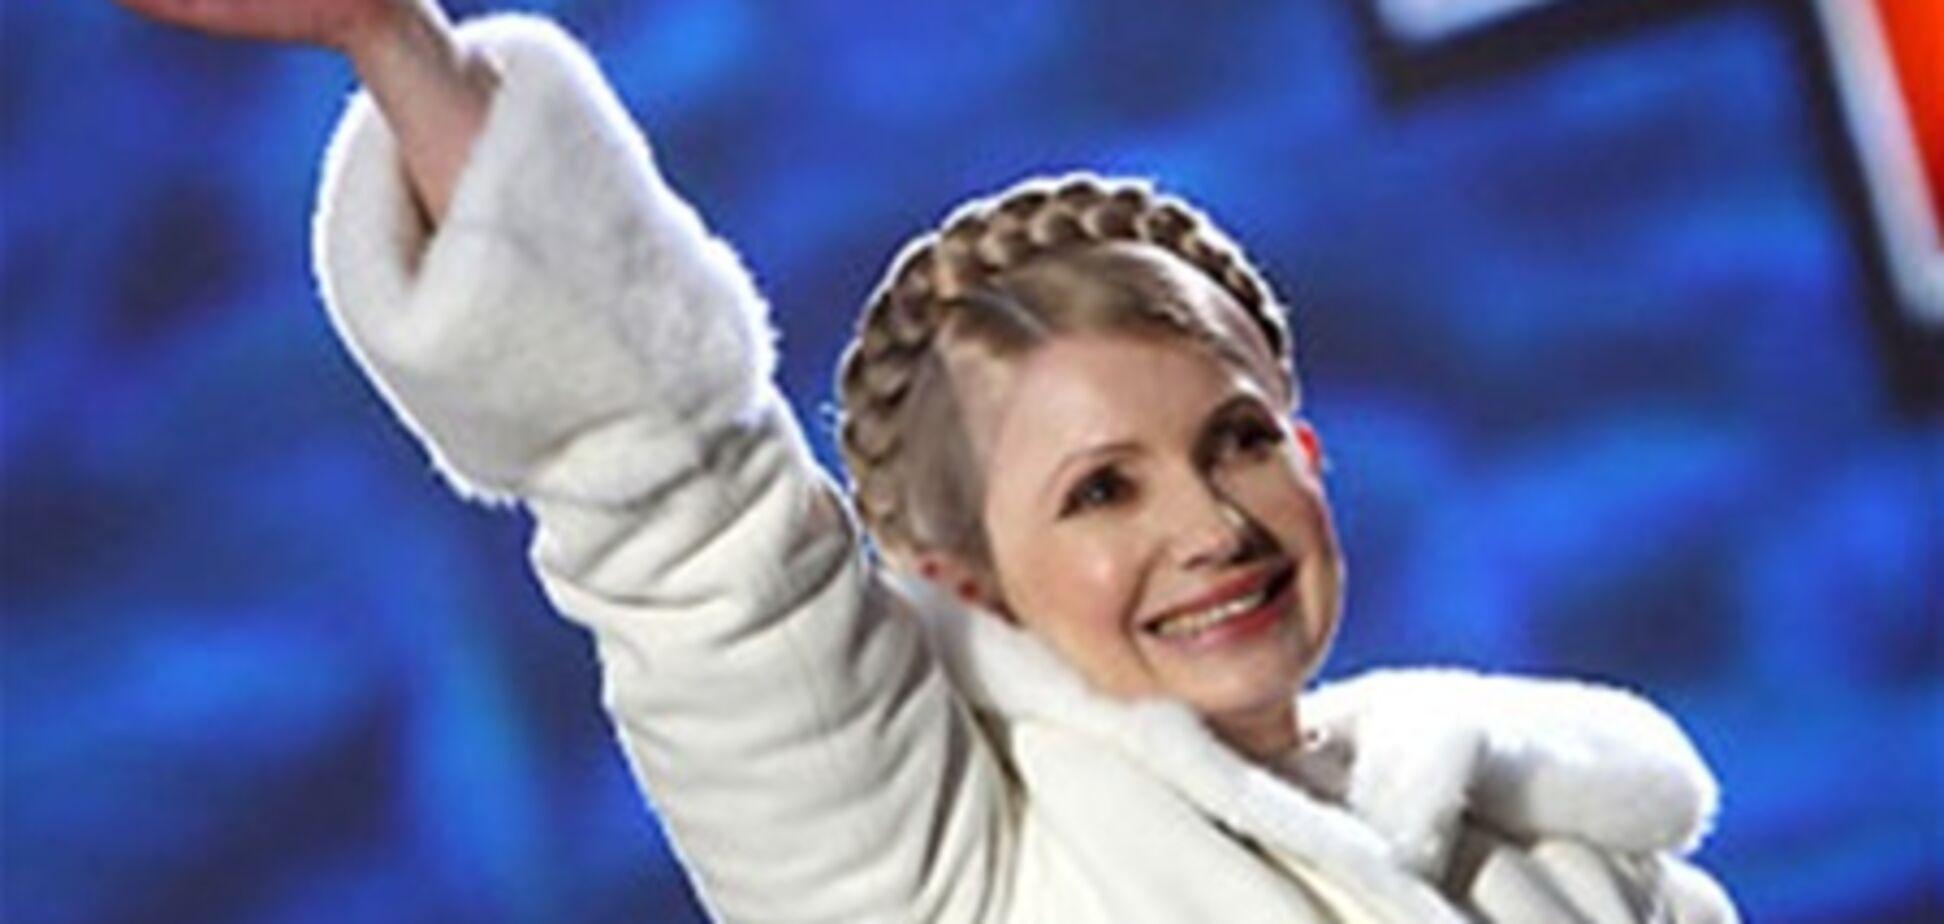 Тимошенко витратила на меха $ 13 тисяч